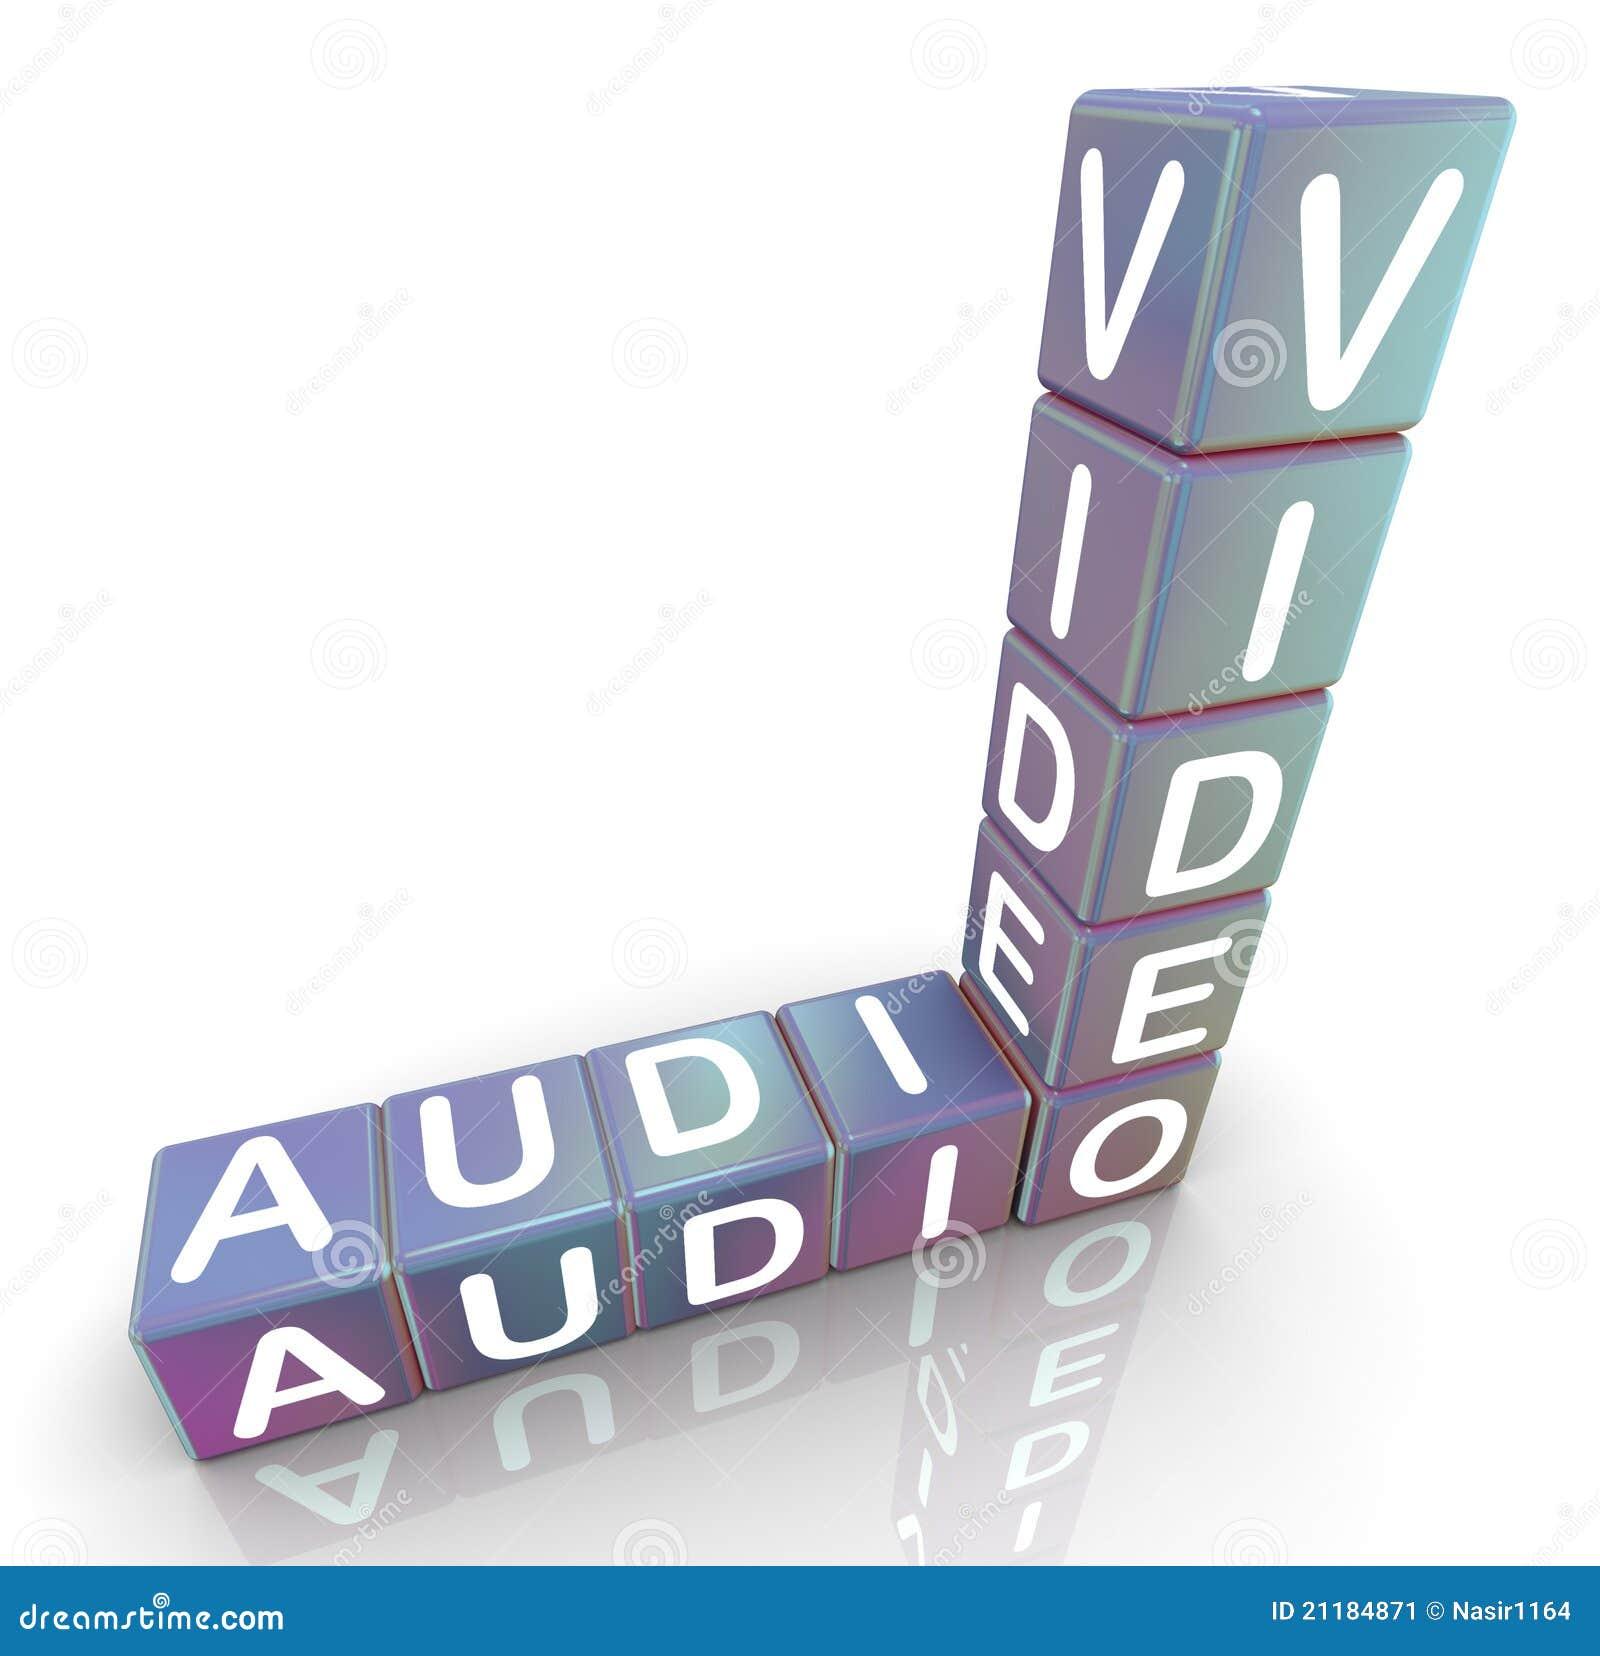 Audio video crossword